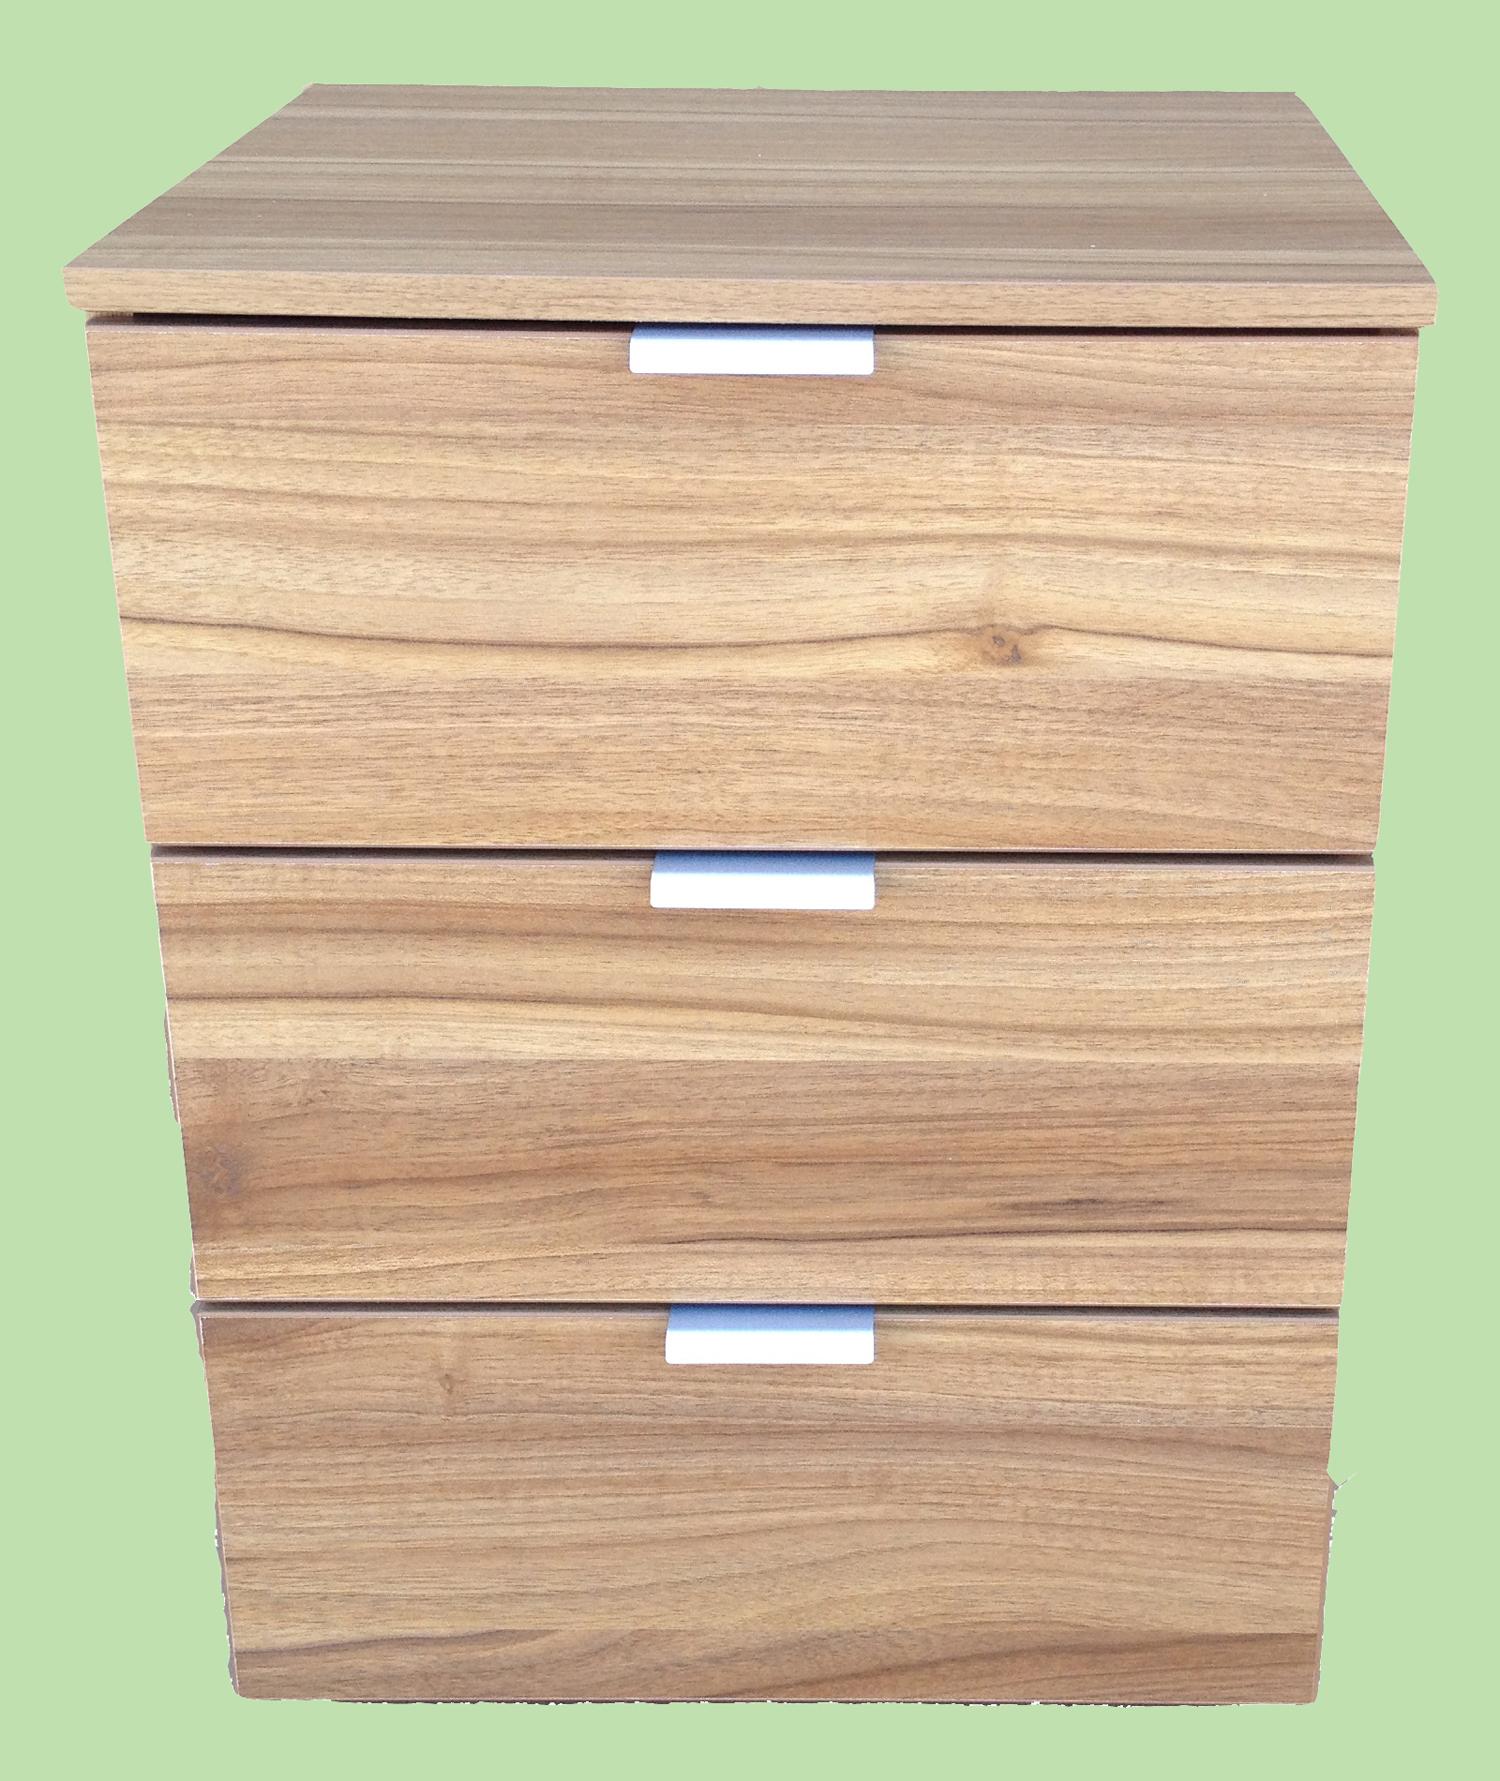 nachtkommode boxspring nachtkonsole kommode schlafzimmer mooreiche grau walnuss ebay. Black Bedroom Furniture Sets. Home Design Ideas